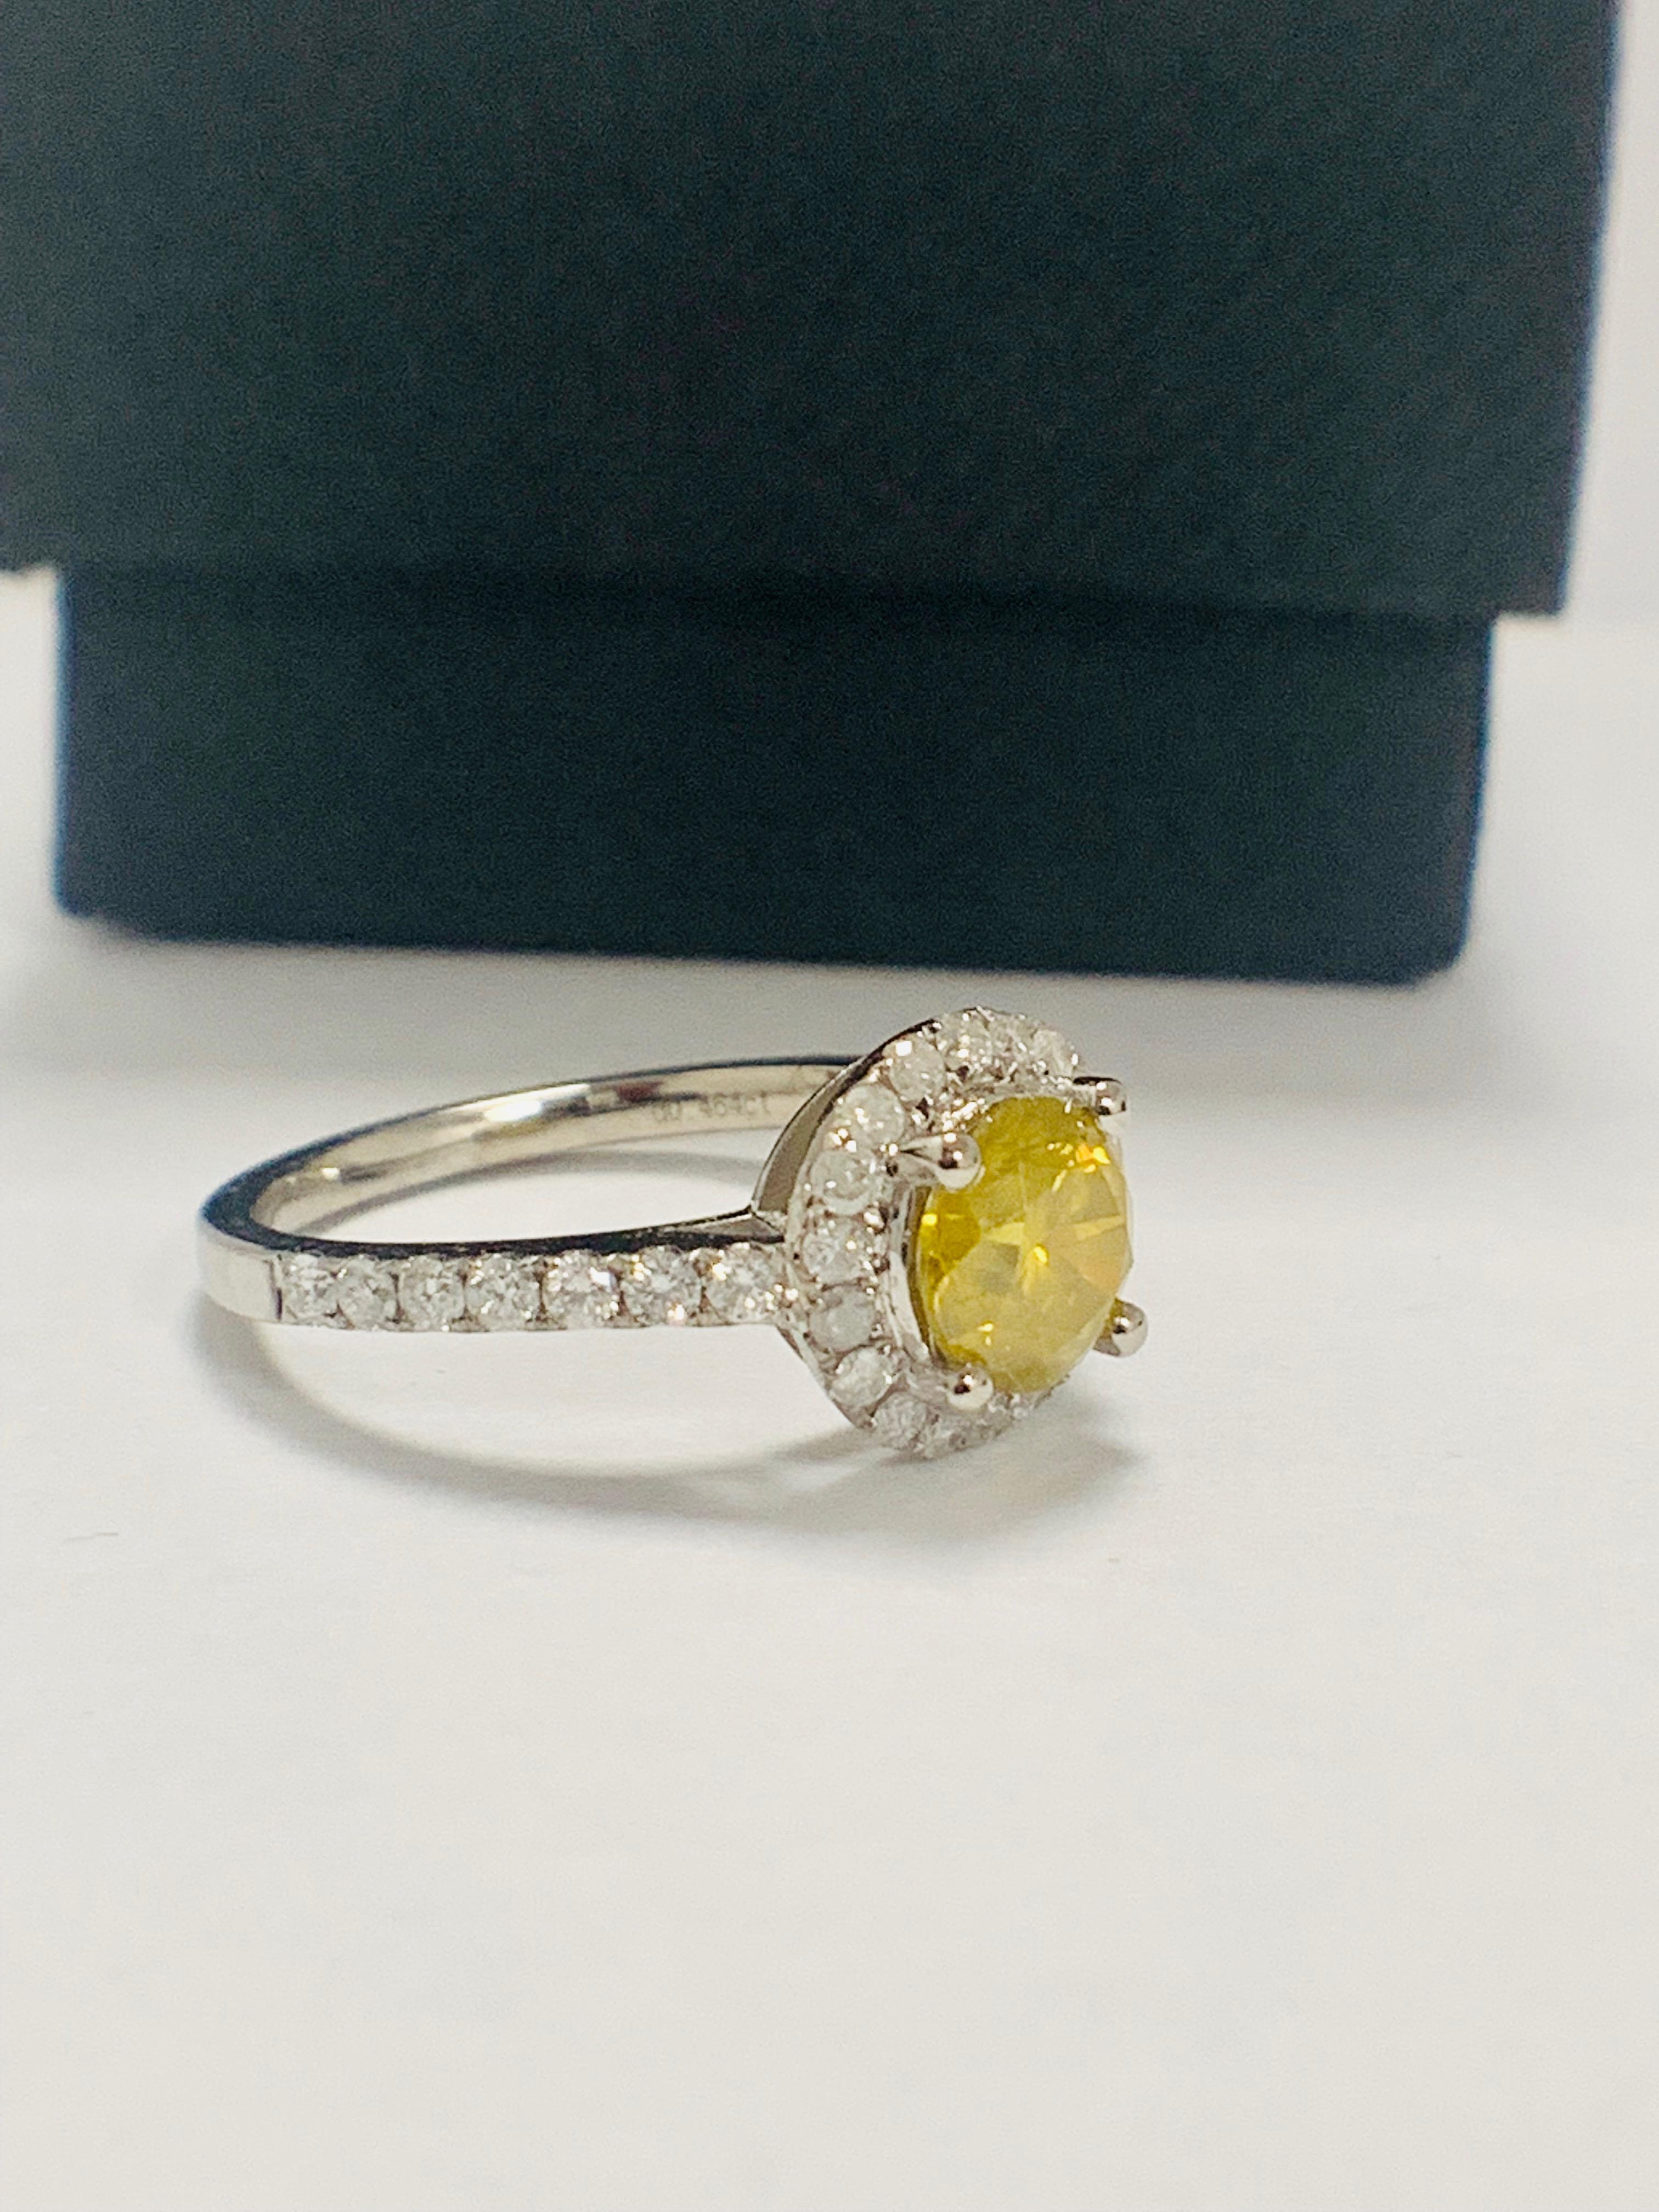 14ct White Gold Diamond ring featuring centre, round brilliant cut, yellow Diamond (1.08ct) - Image 8 of 12